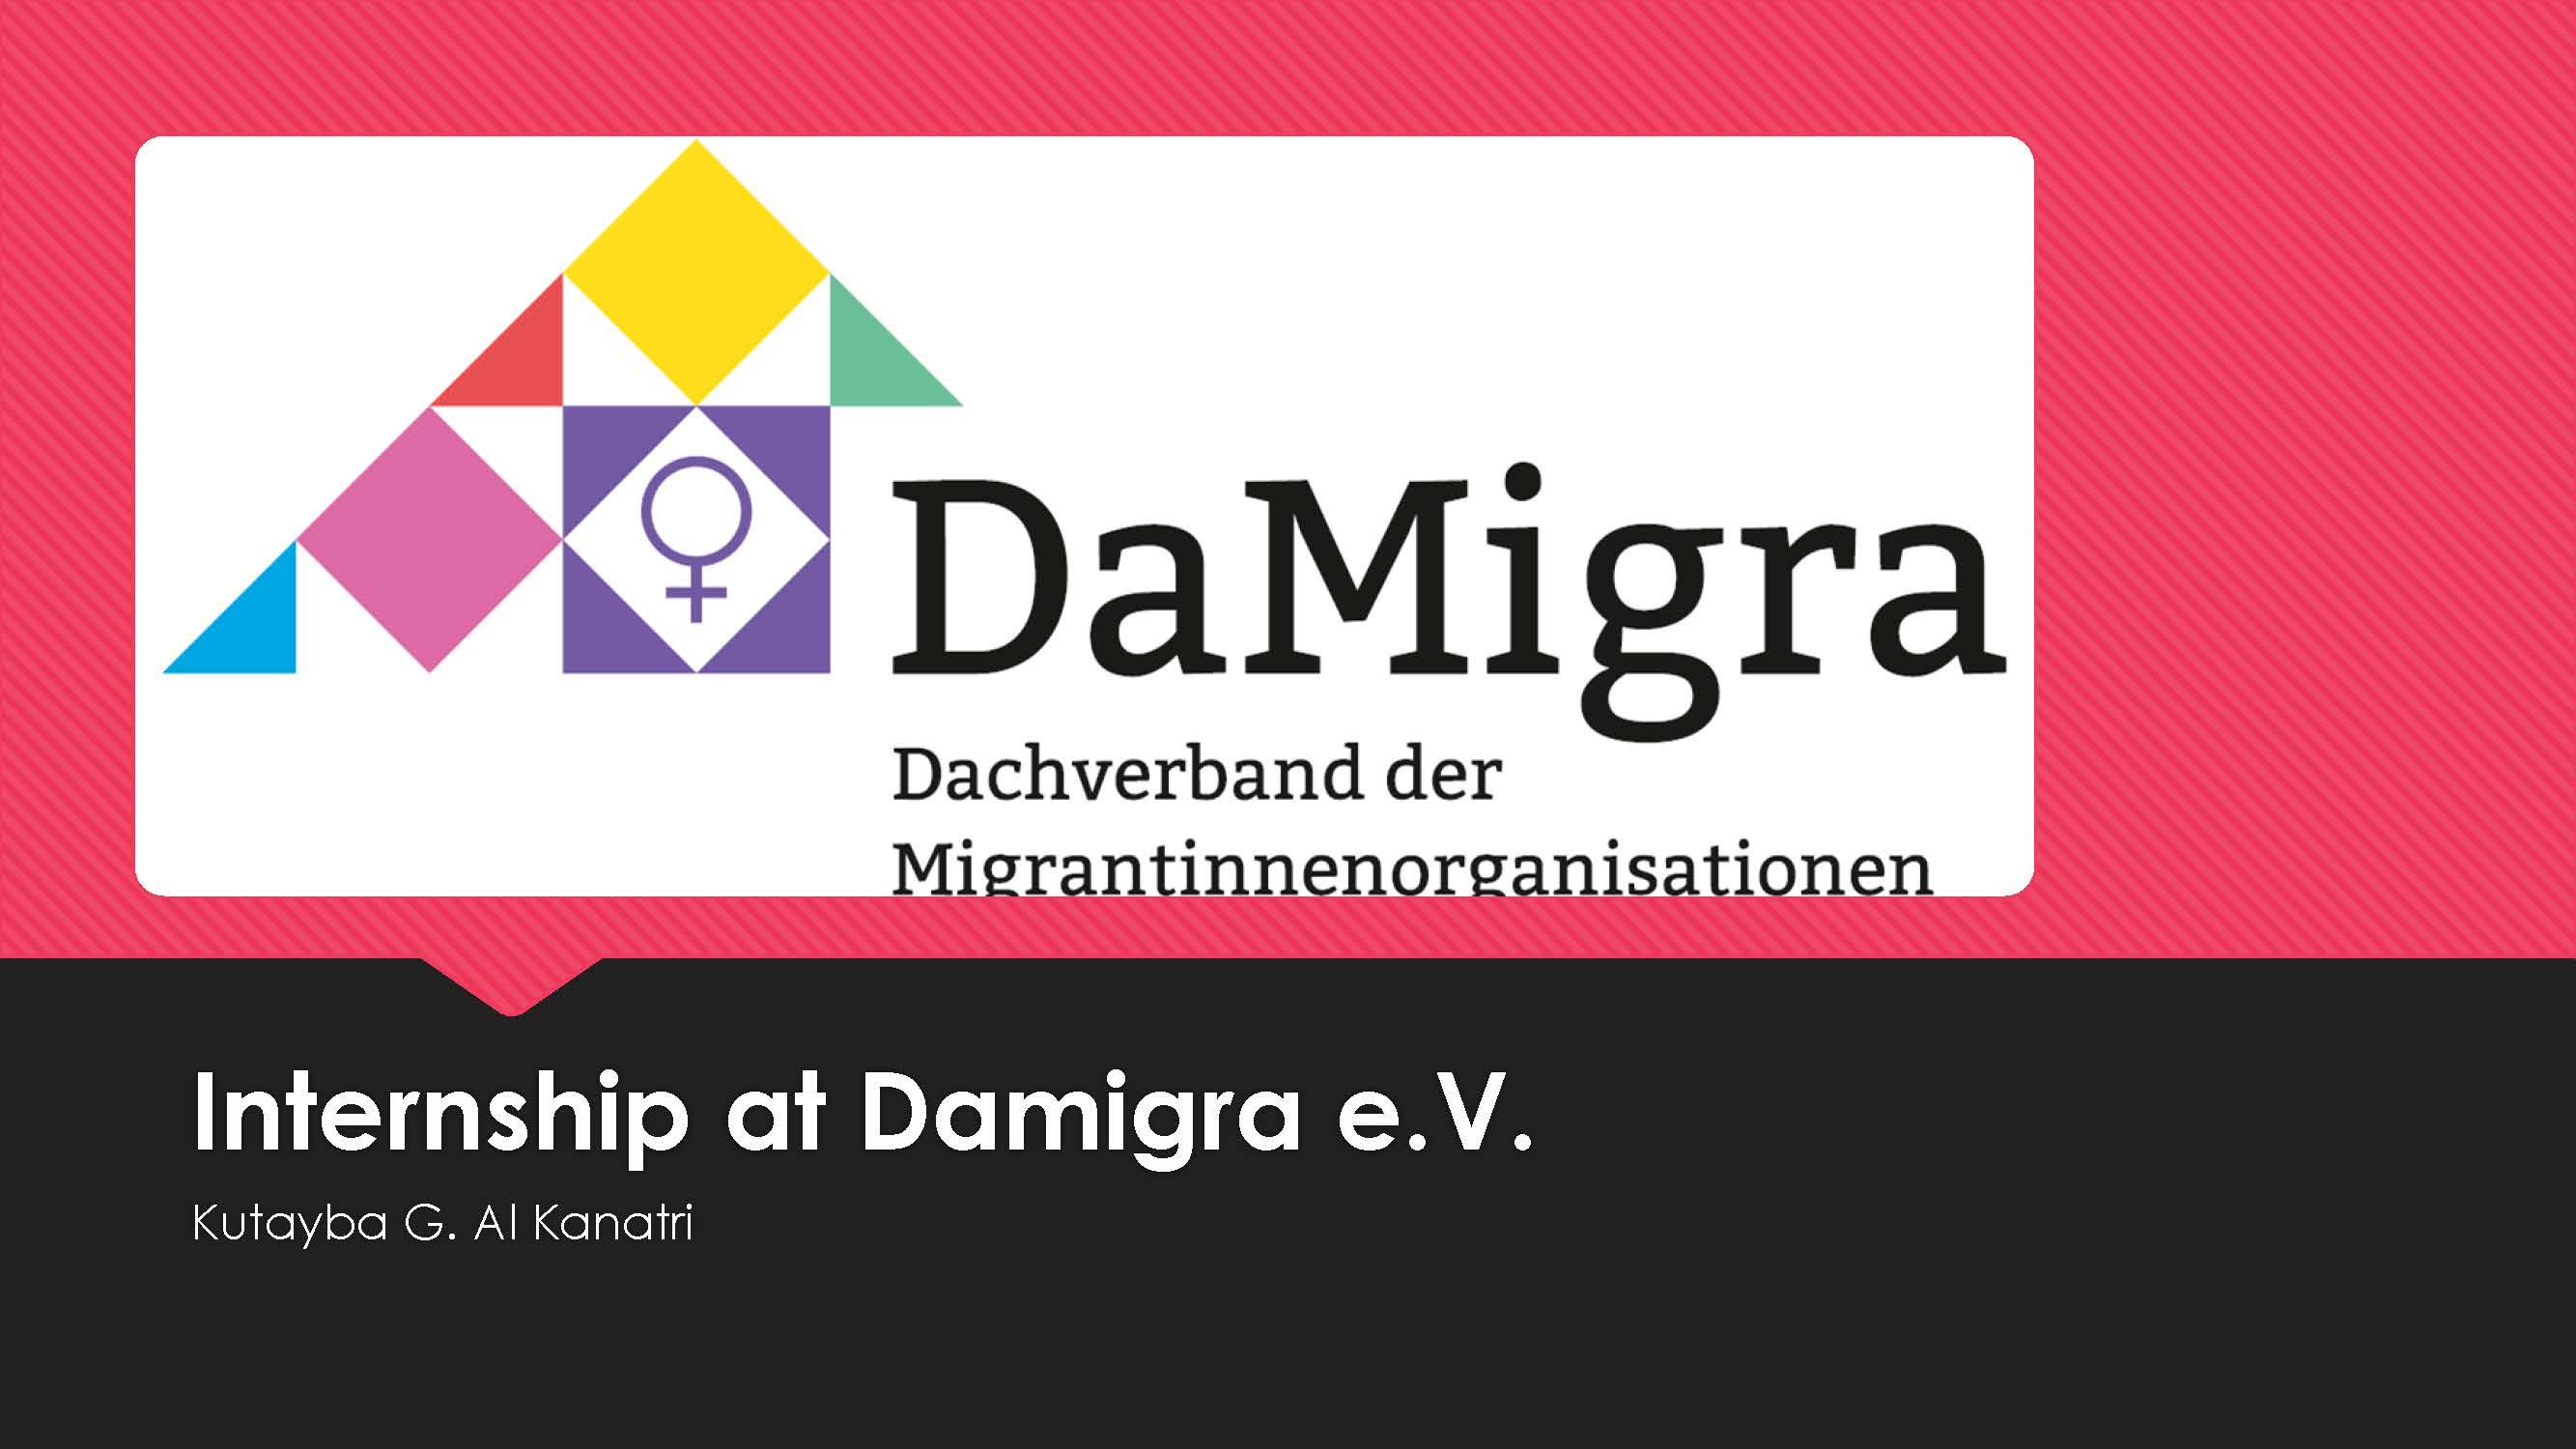 Al Kanatri - Internship at DaMigra 2019